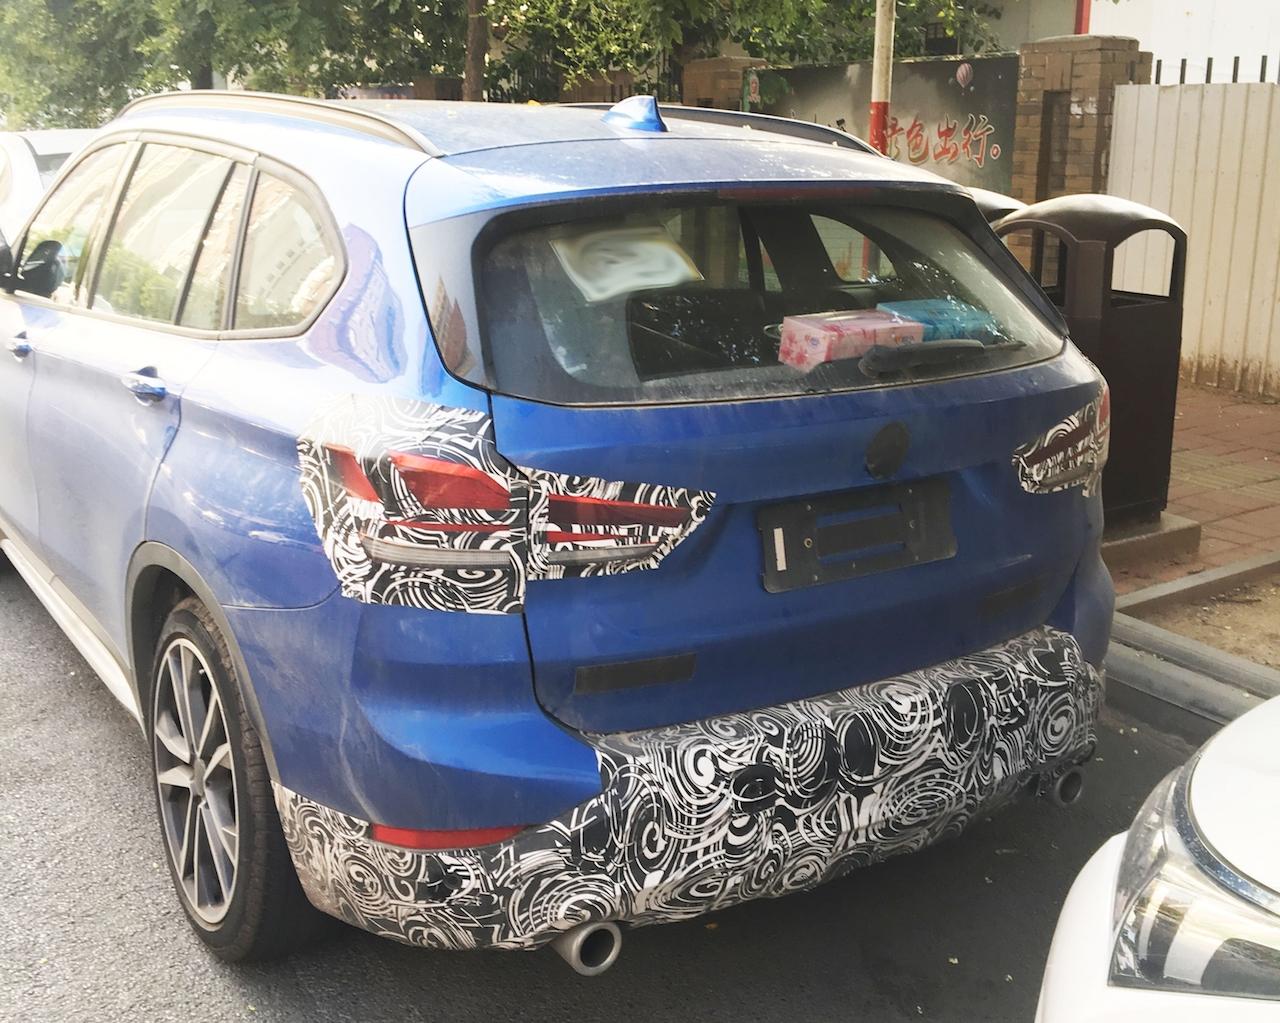 2019 BMW X1 (facelift) rear three quarters spy shot